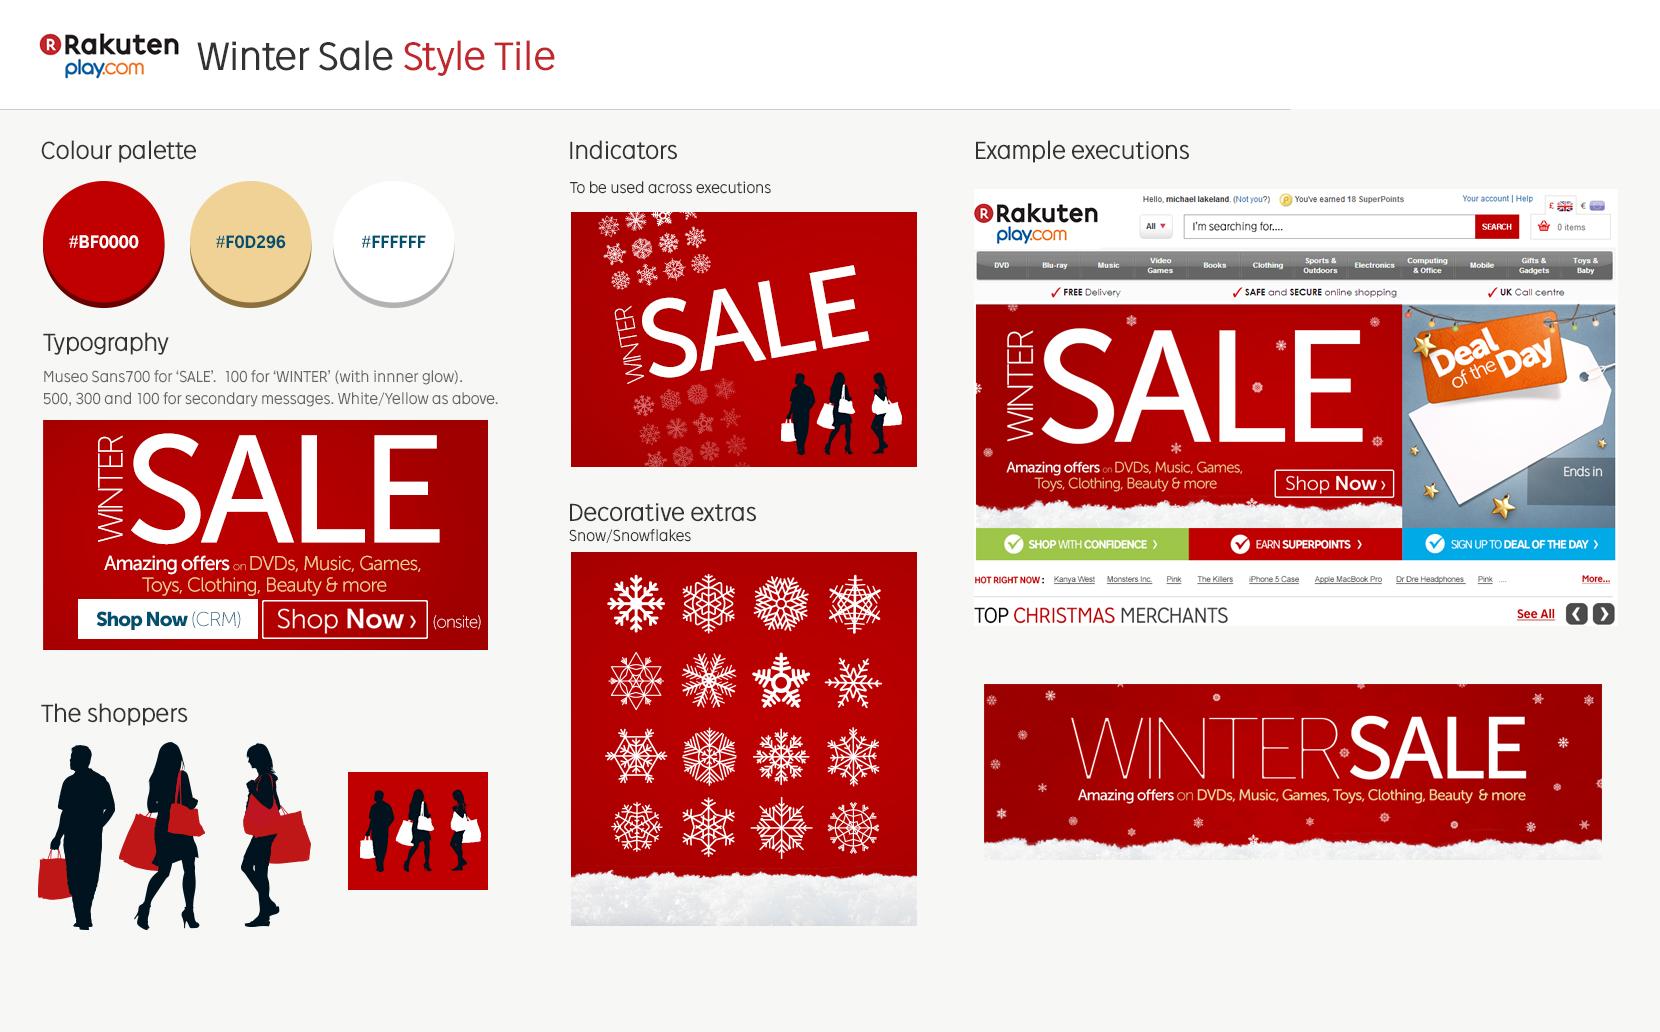 Winter-Sale-Style-Tile.jpg